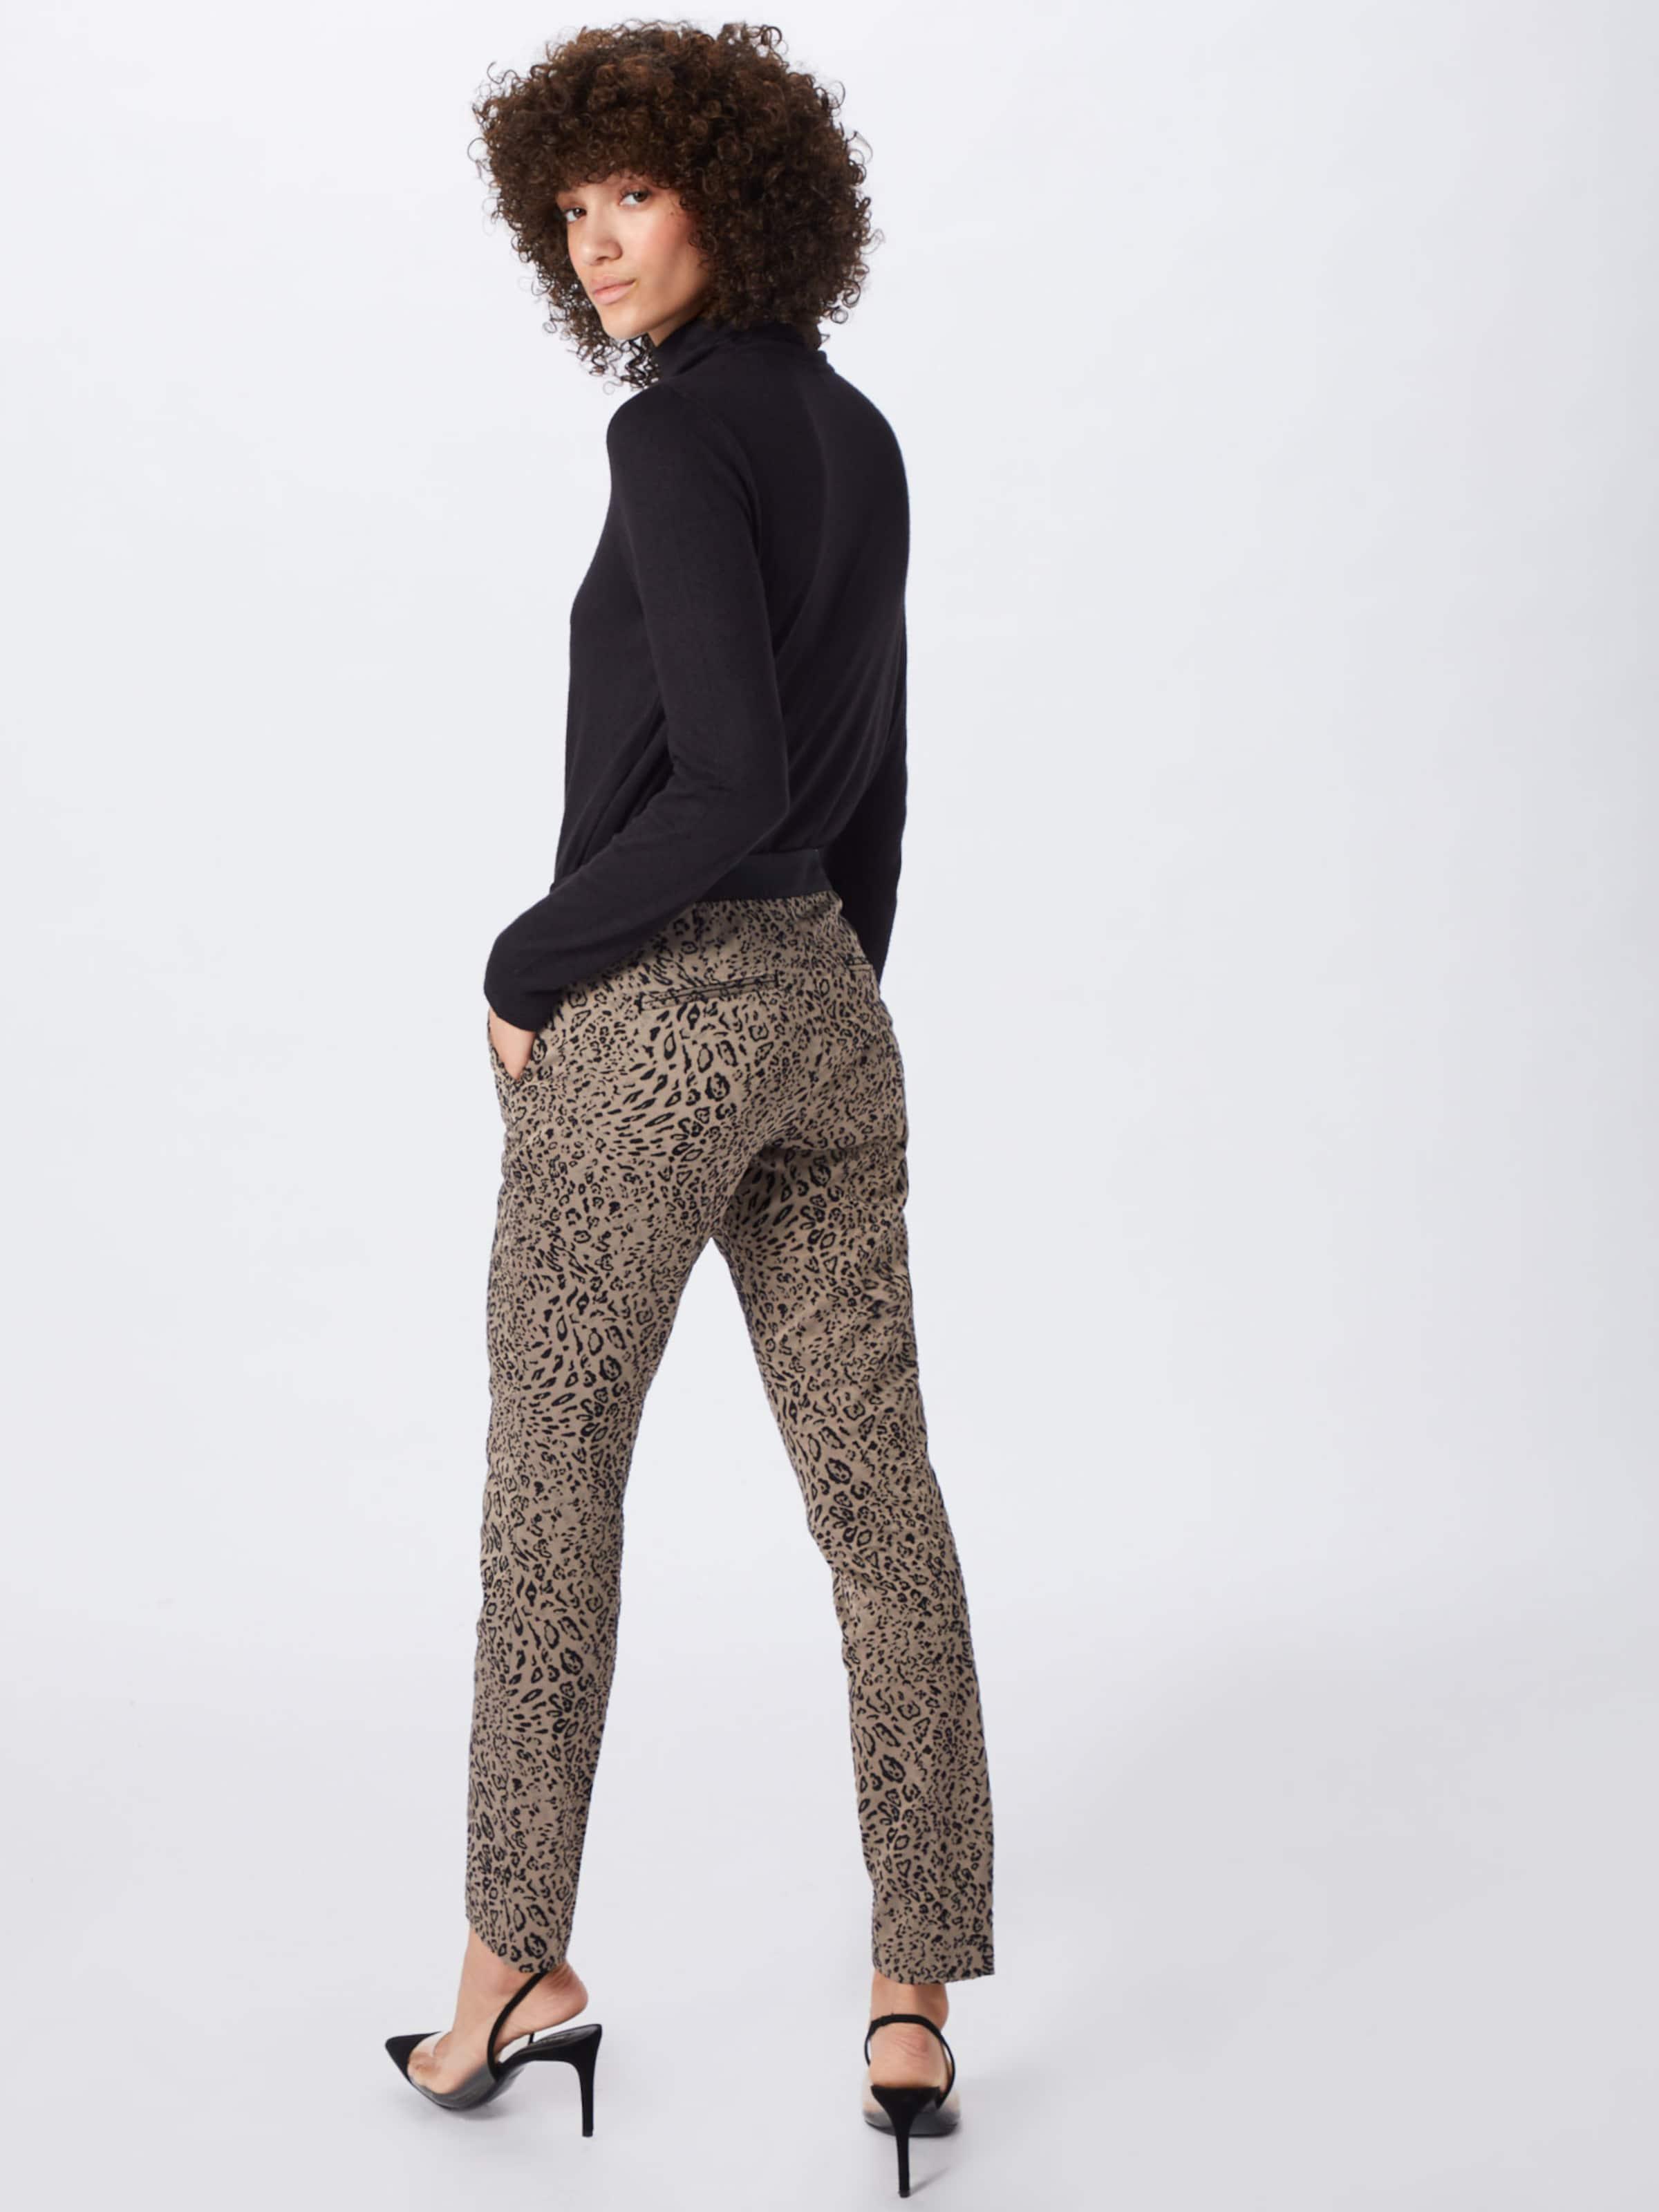 Comma Pantalon En Chino FoncéNoir Beige uKc5JTlF13